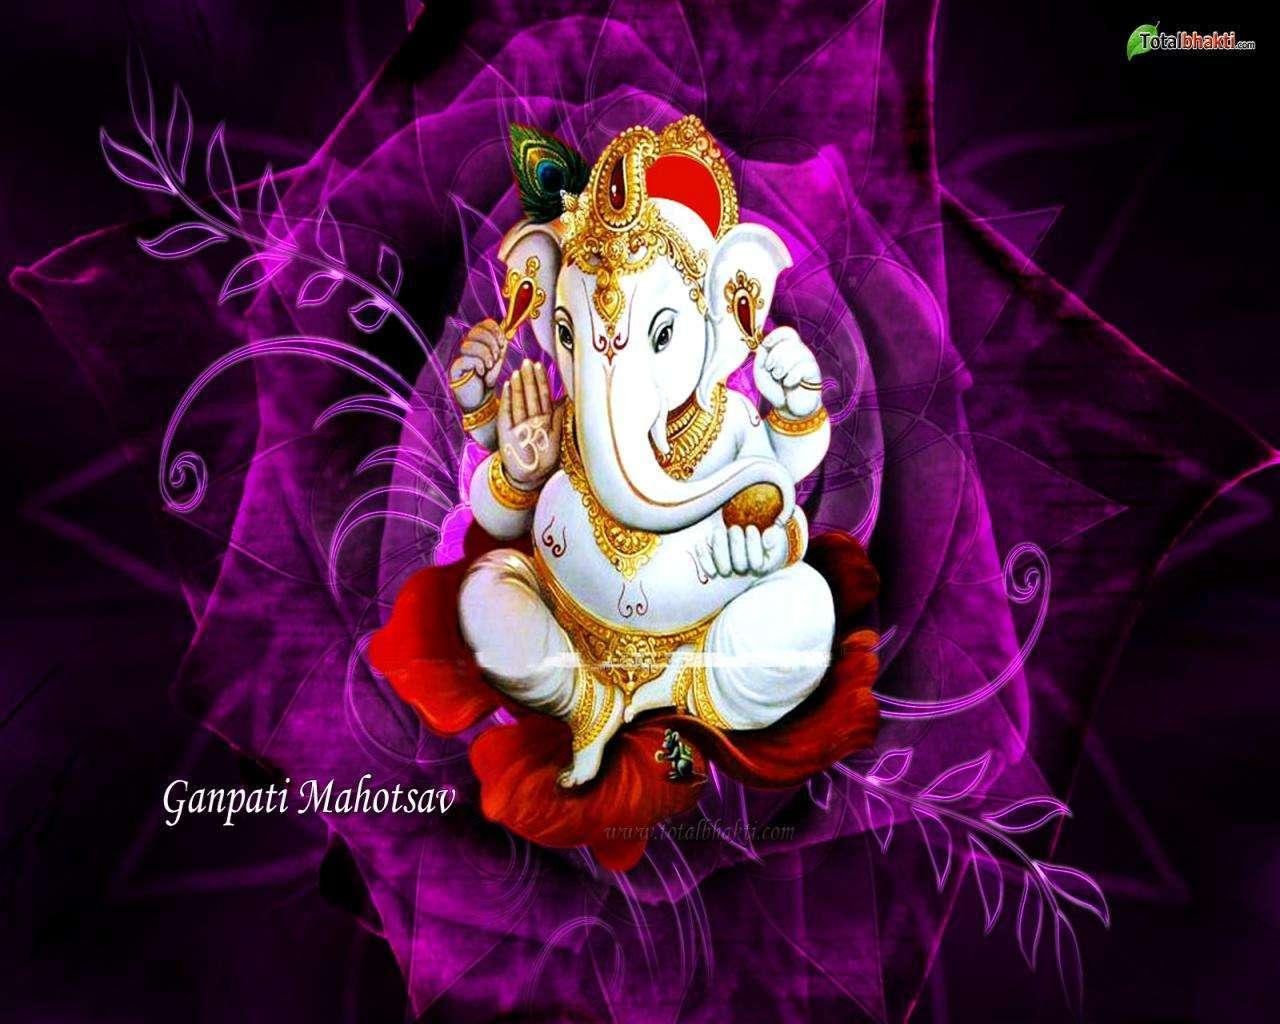 God Ganesha Wallpaper Photos